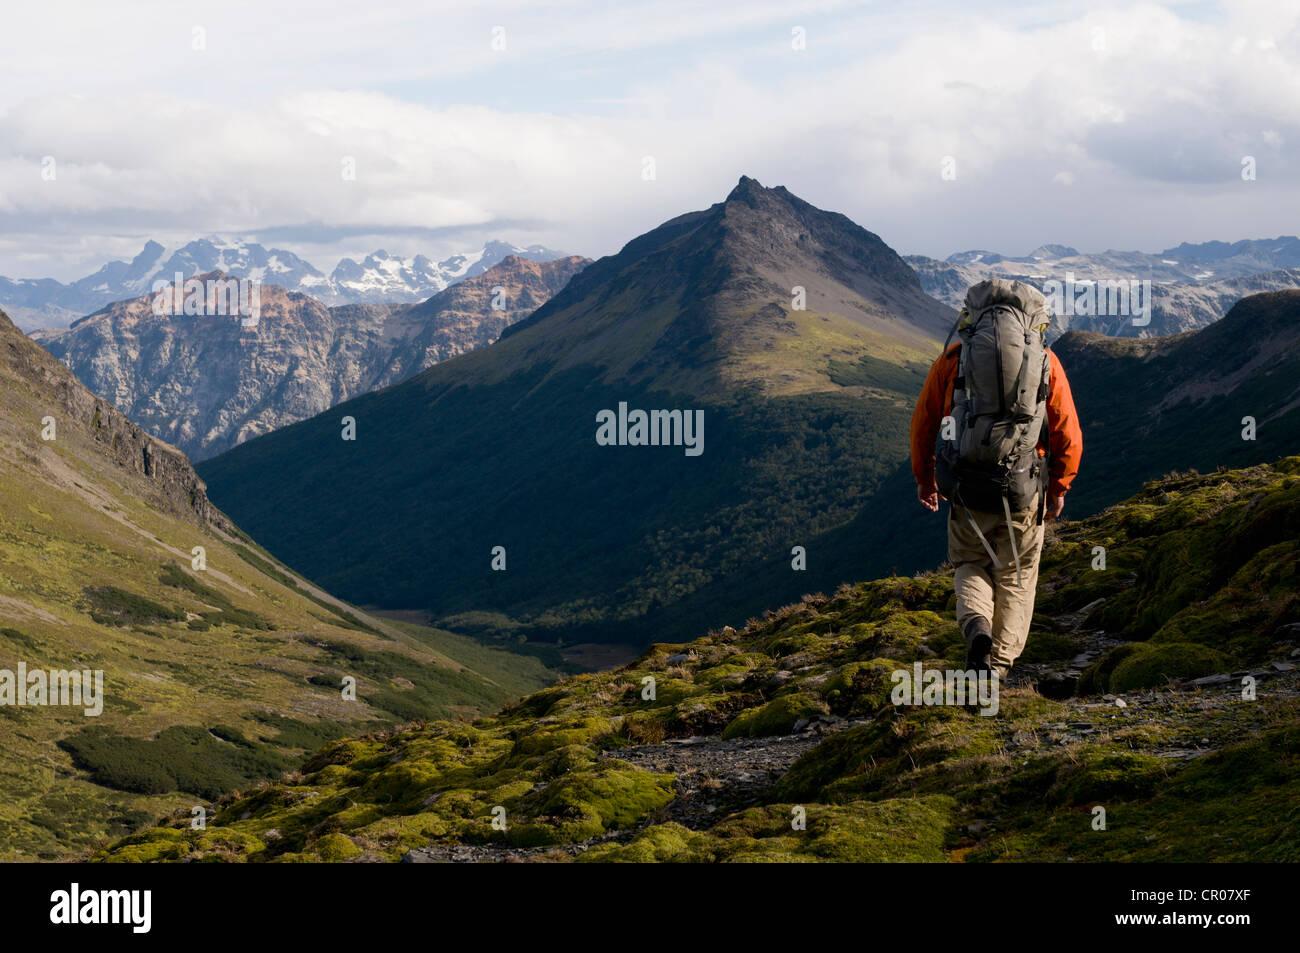 Hiker walking in grassy hills - Stock Image